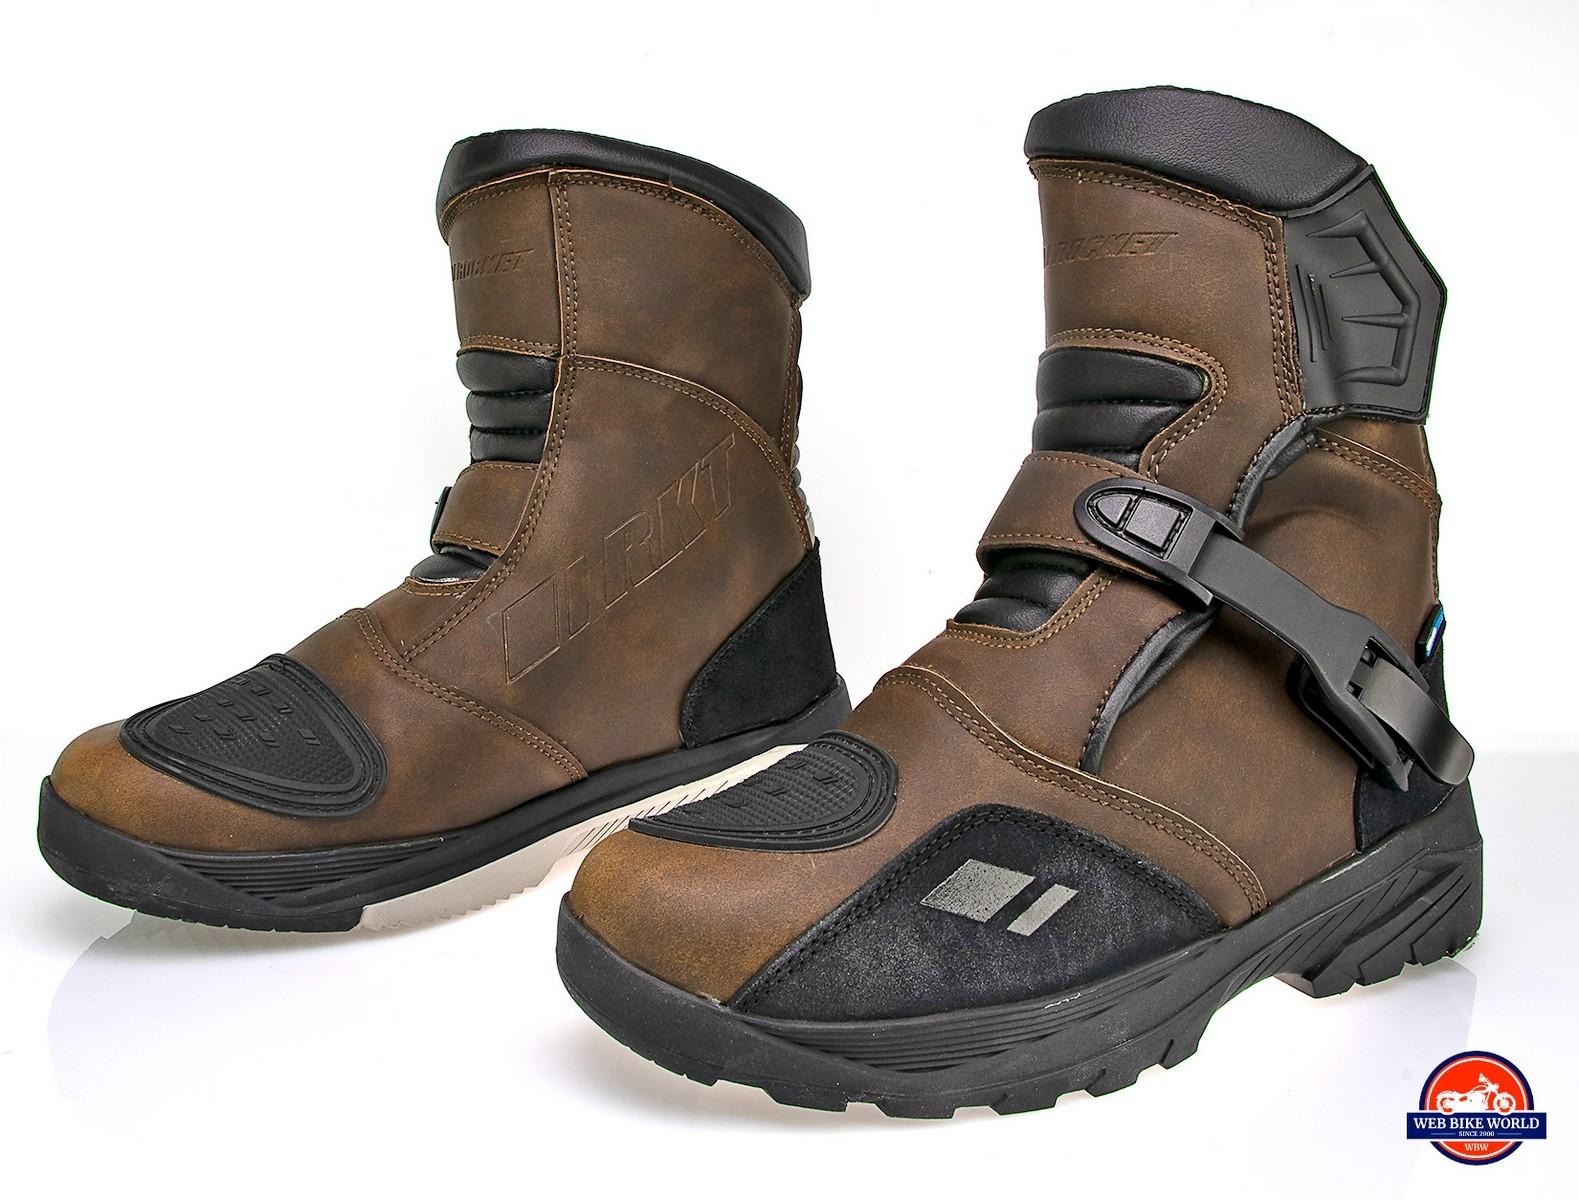 The Joe Rocket Canada Whistler Adventure boots.